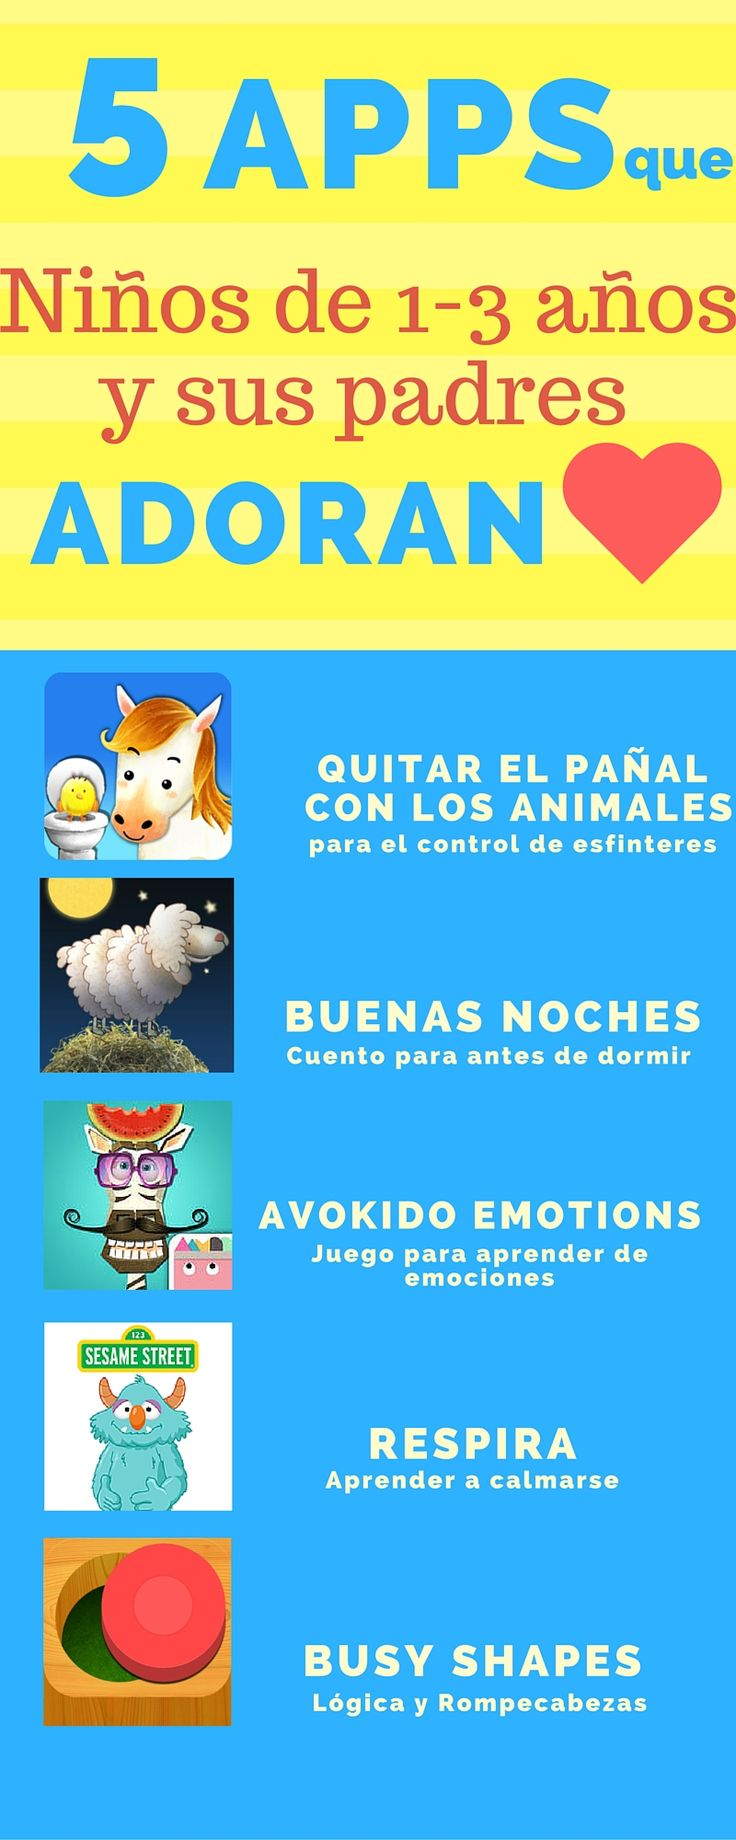 5 mejores apps para ninos de 2 a 3 anos adoran.jpg